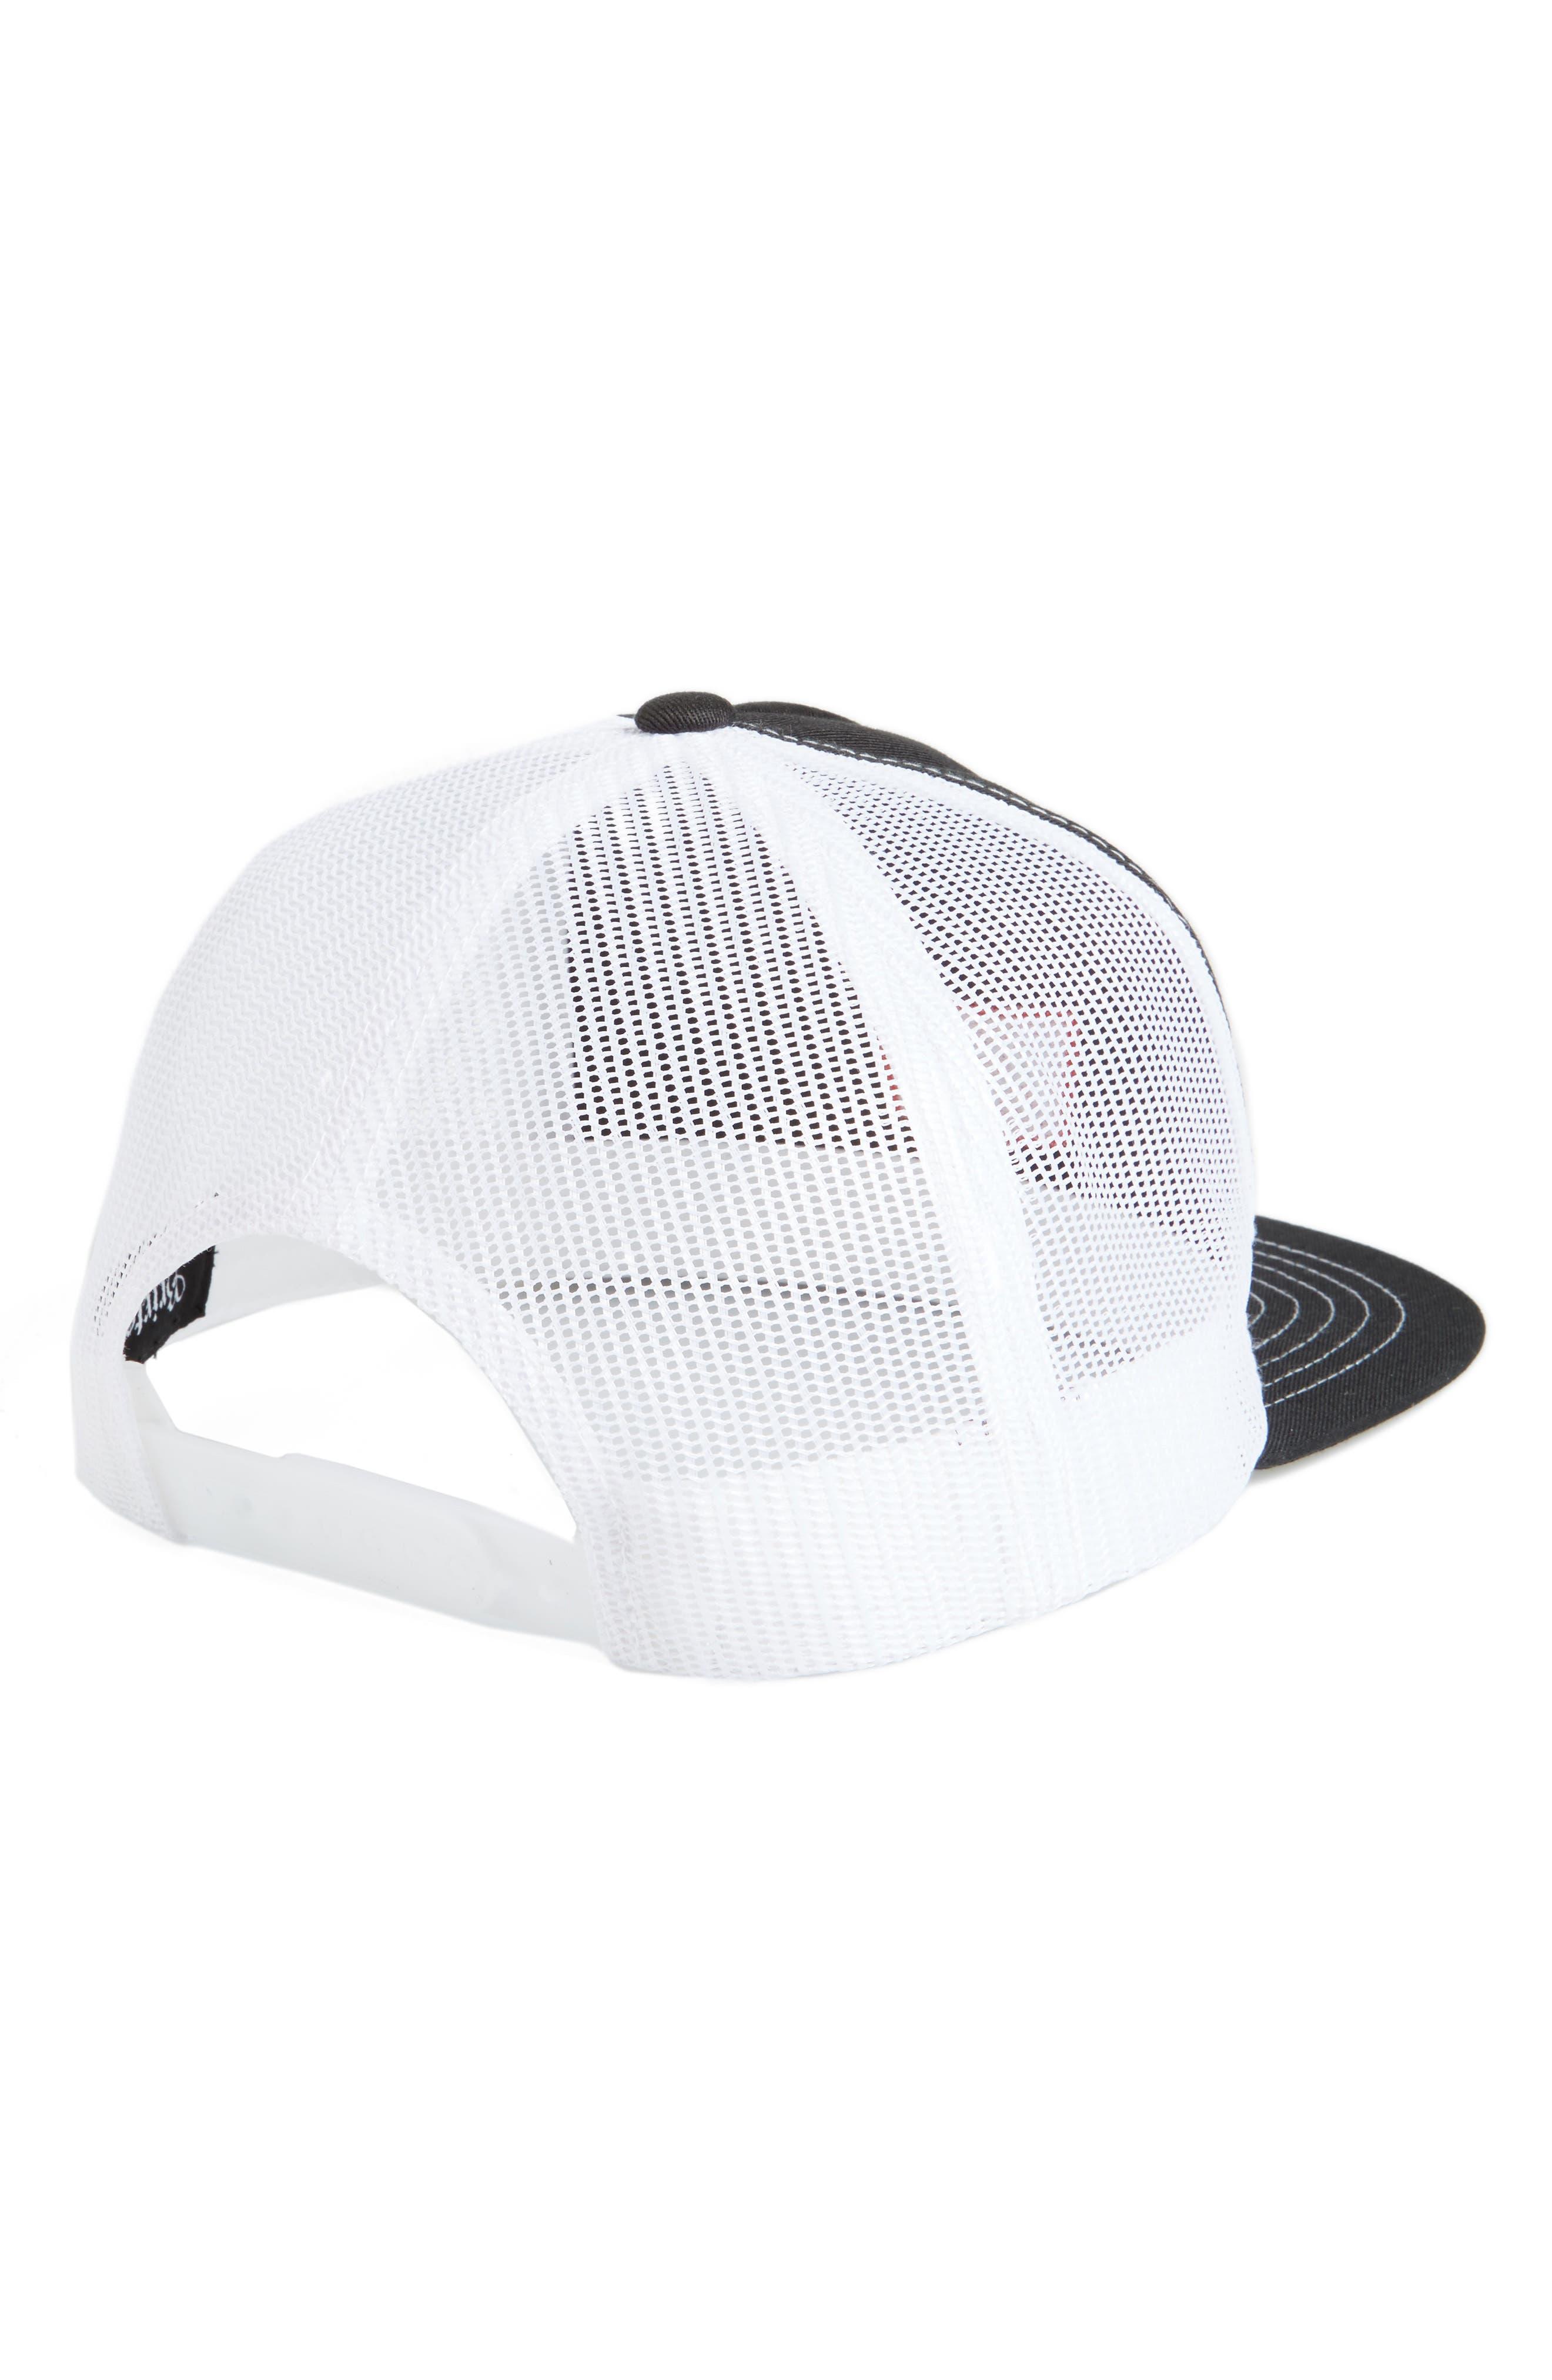 Stith Mesh Snapback Baseball Cap,                             Alternate thumbnail 2, color,                             001